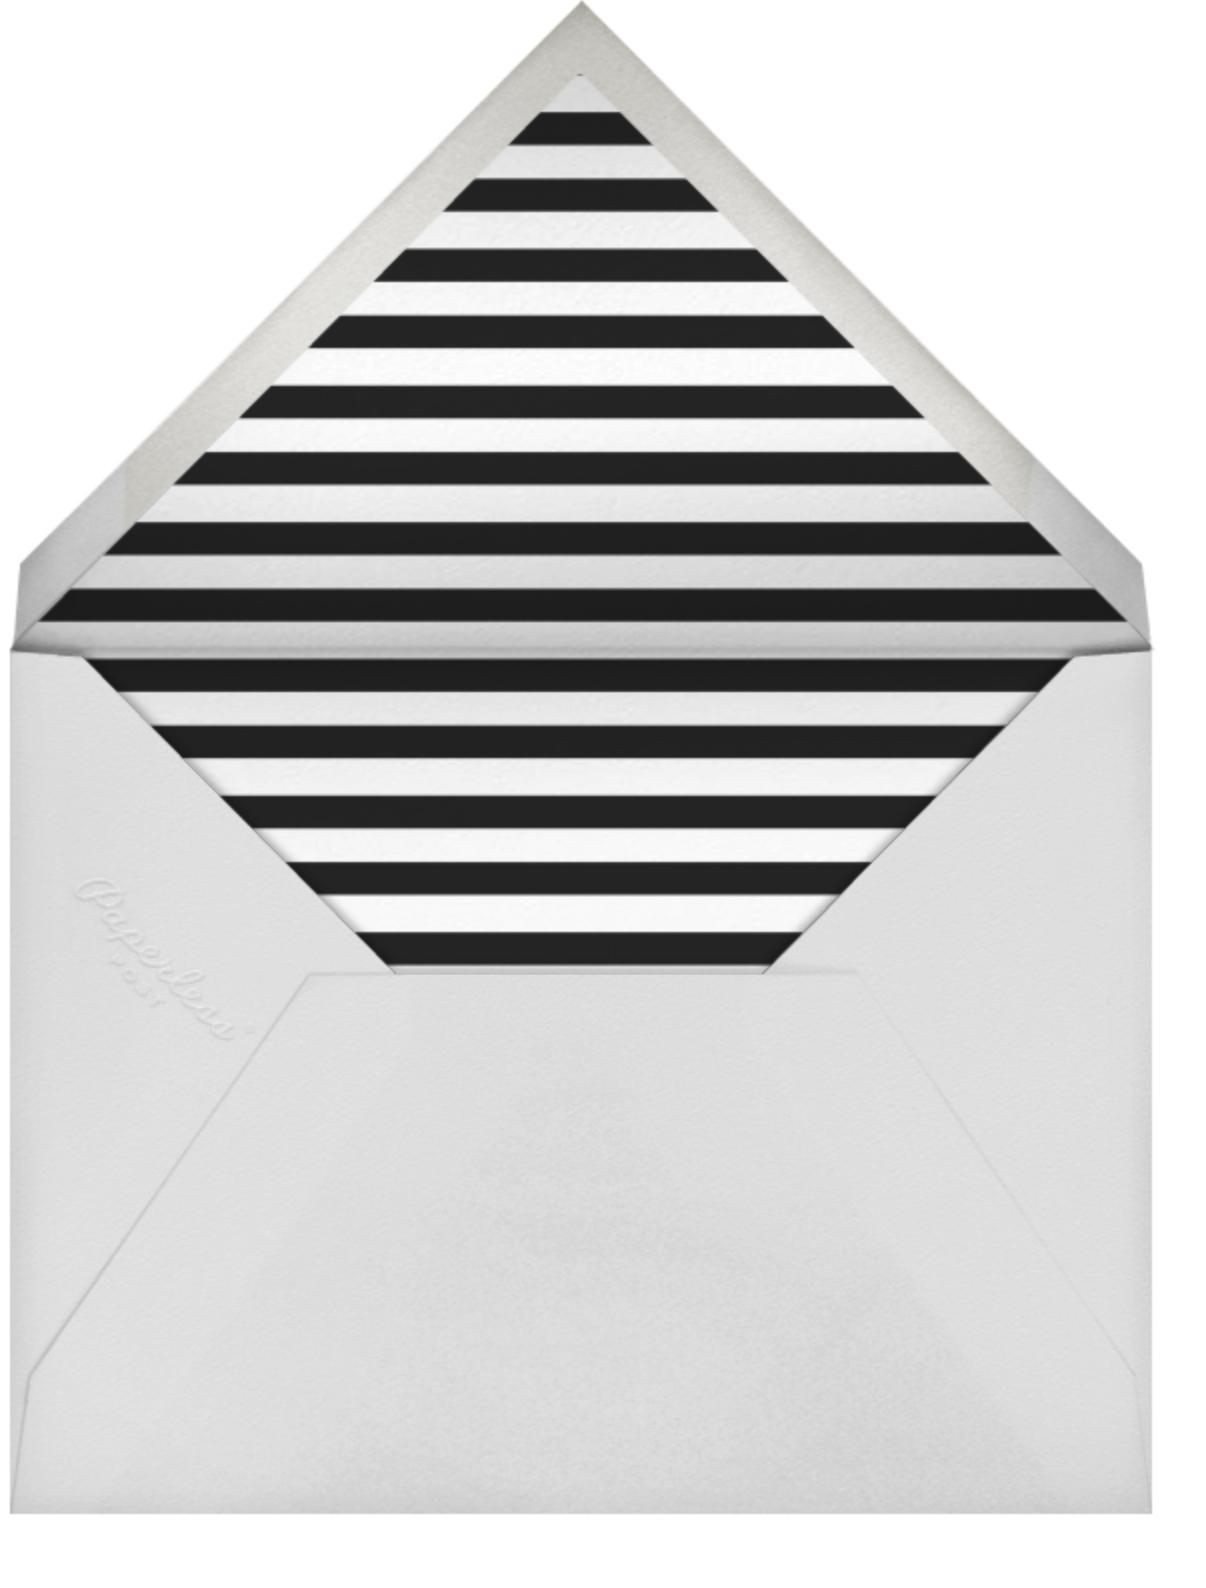 Confetti Horizontal (Single-Sided Photo) - Rose Gold - kate spade new york - Photo  - envelope back